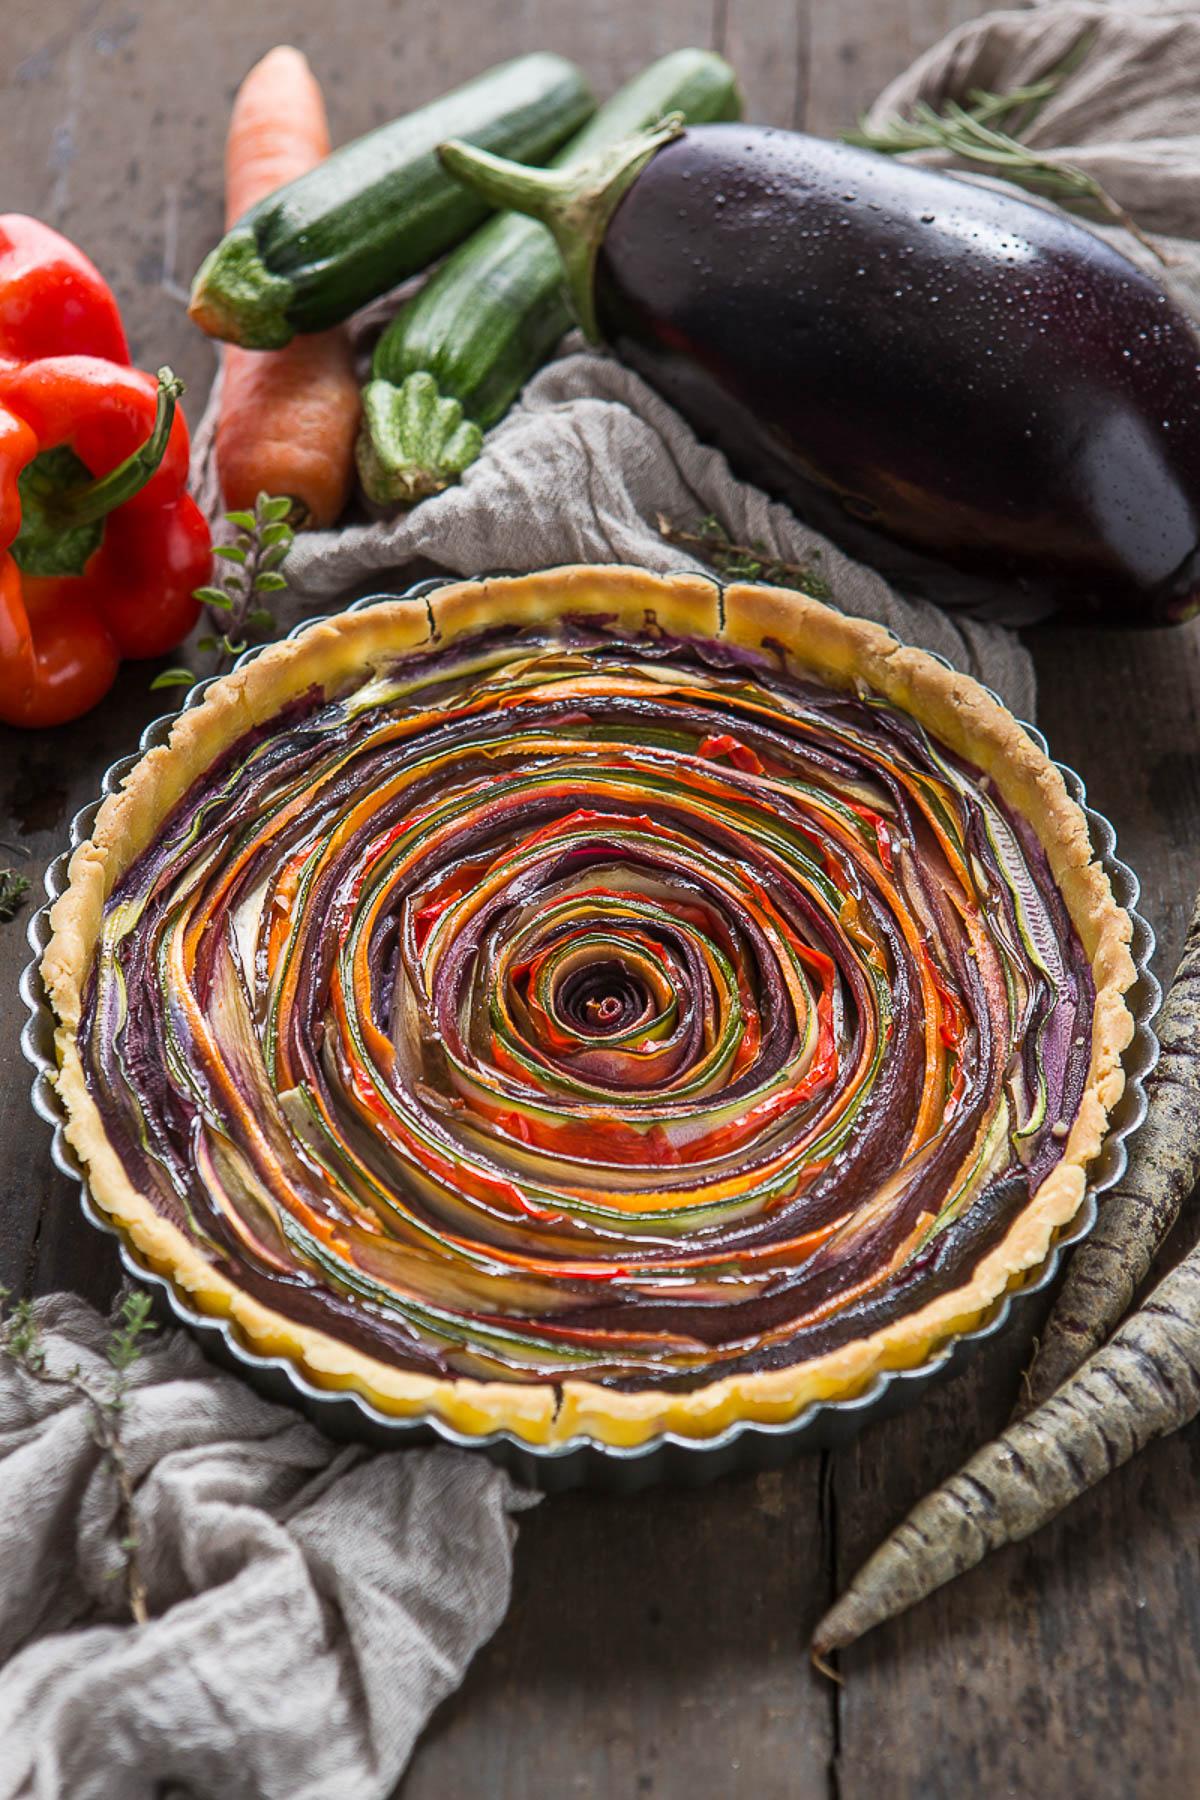 vegan #glutenfree vegetable spiral tart eggplant zucchini carrots pepper | torta salata di verdure a spirale senza glutine senza uova senza burro #vegan con carote zucchine peperoni melanzane